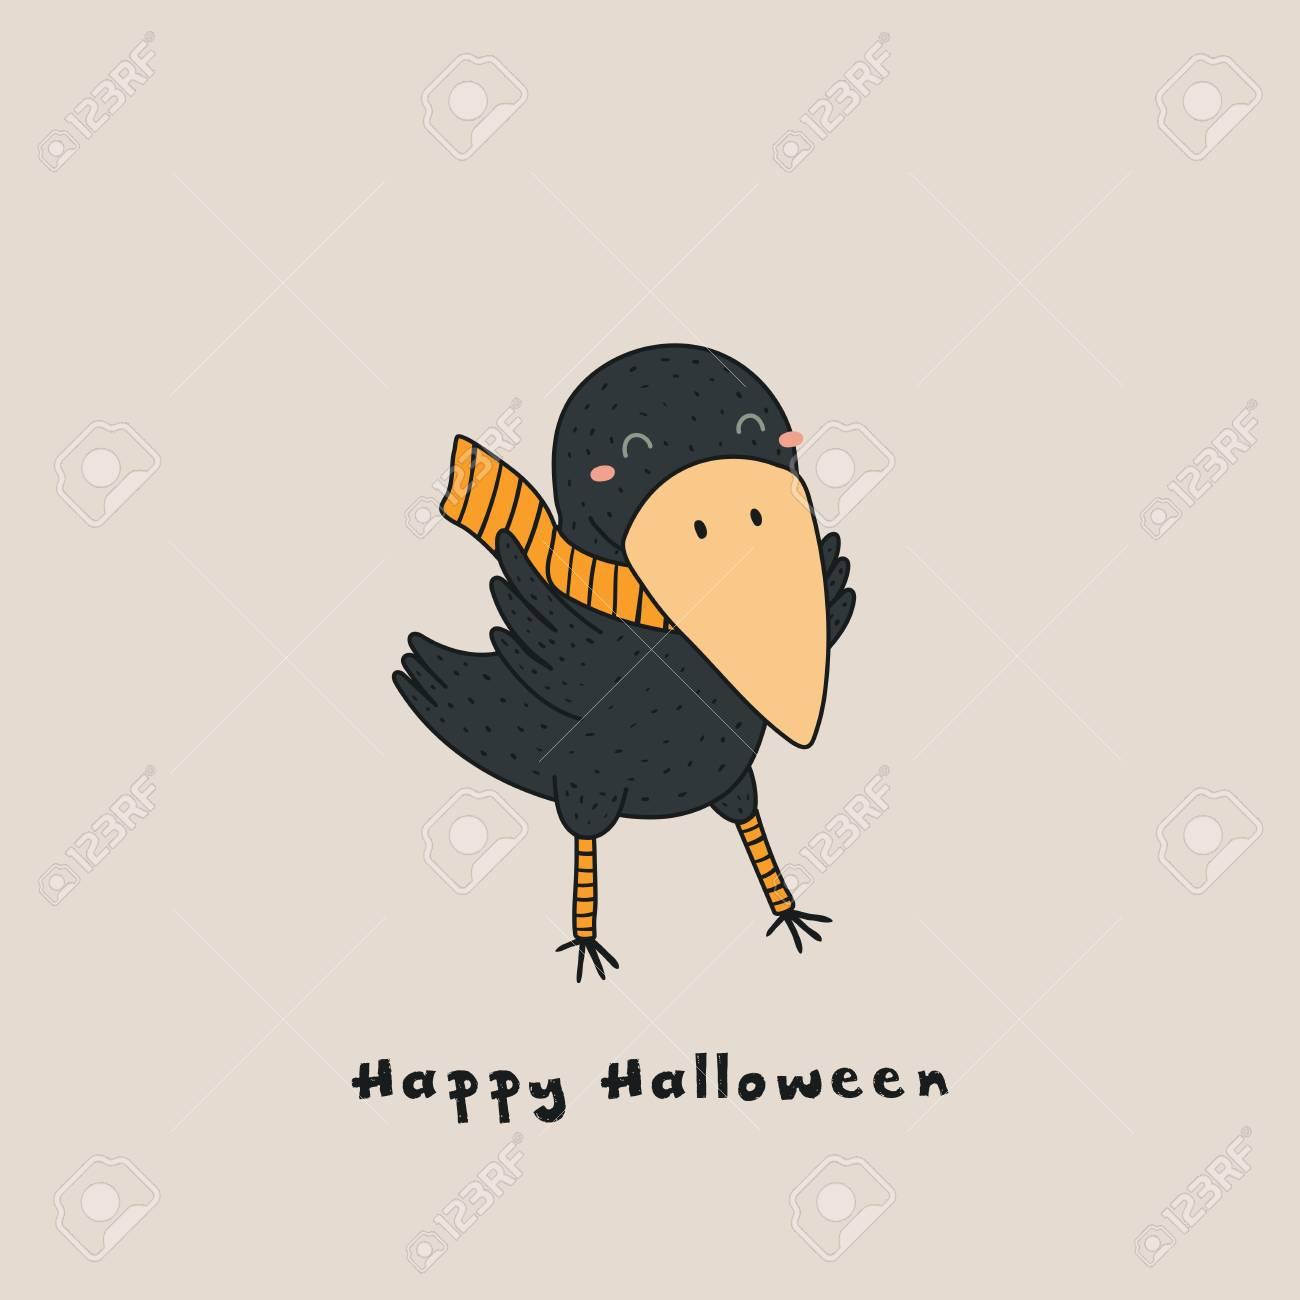 Hand Drawn Vector Illustration Of A Kawaii Funny Crow In A Muffler